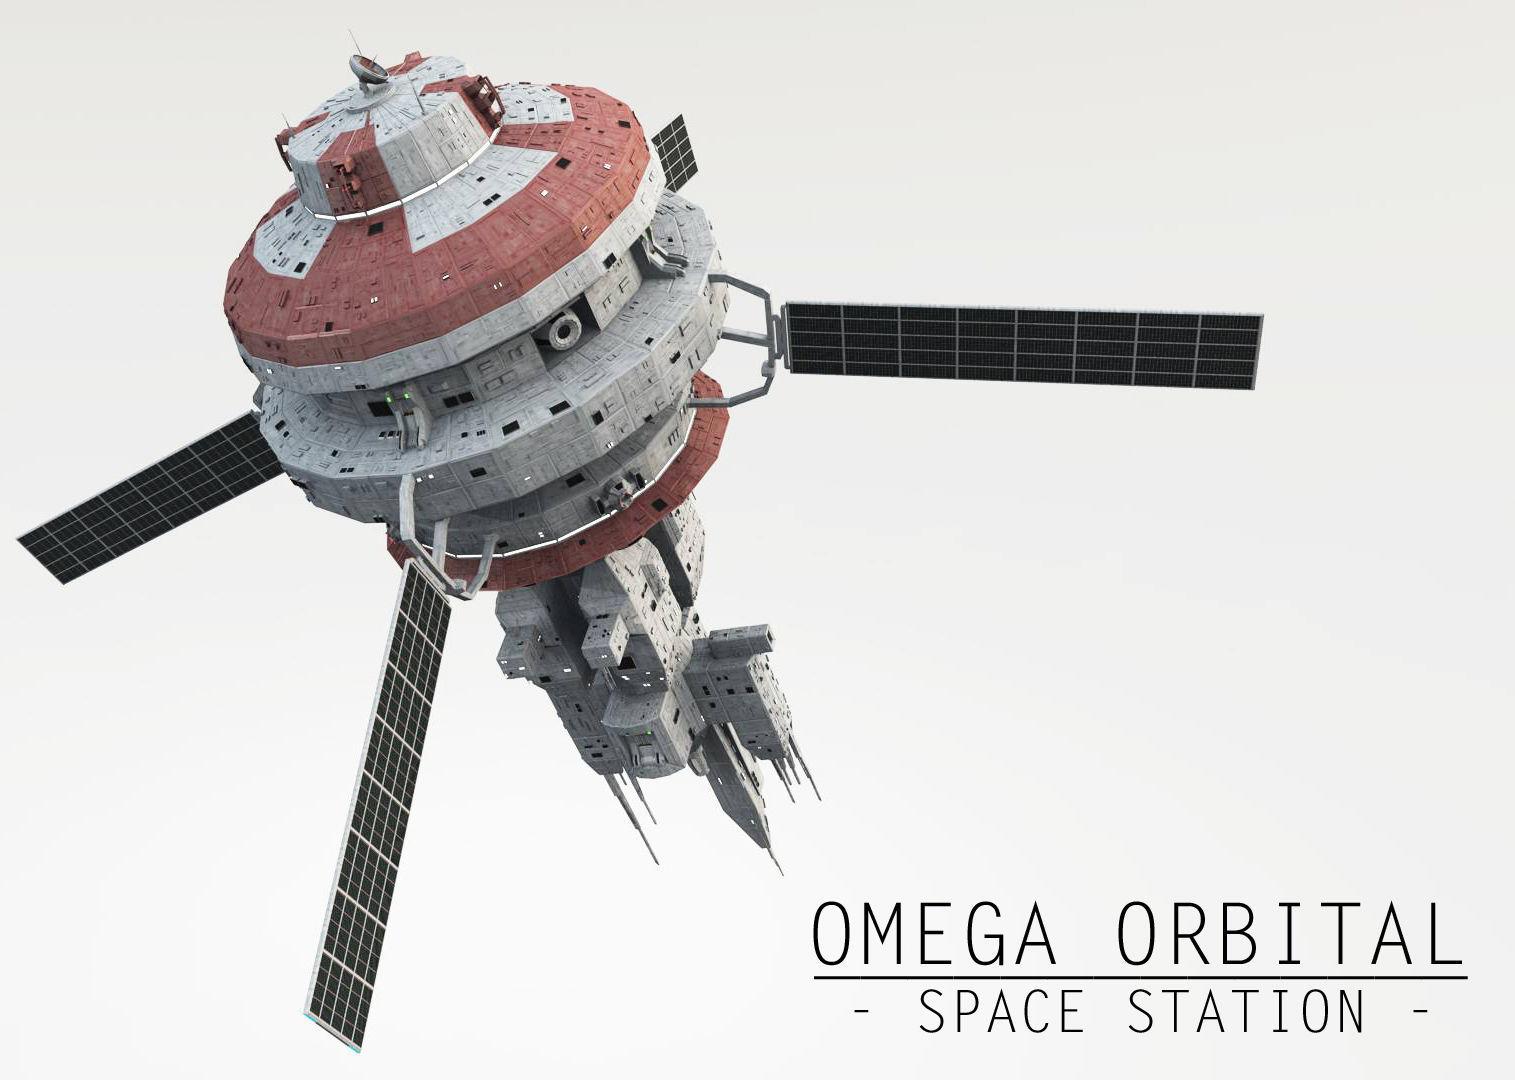 Omega Oribital - Space Station